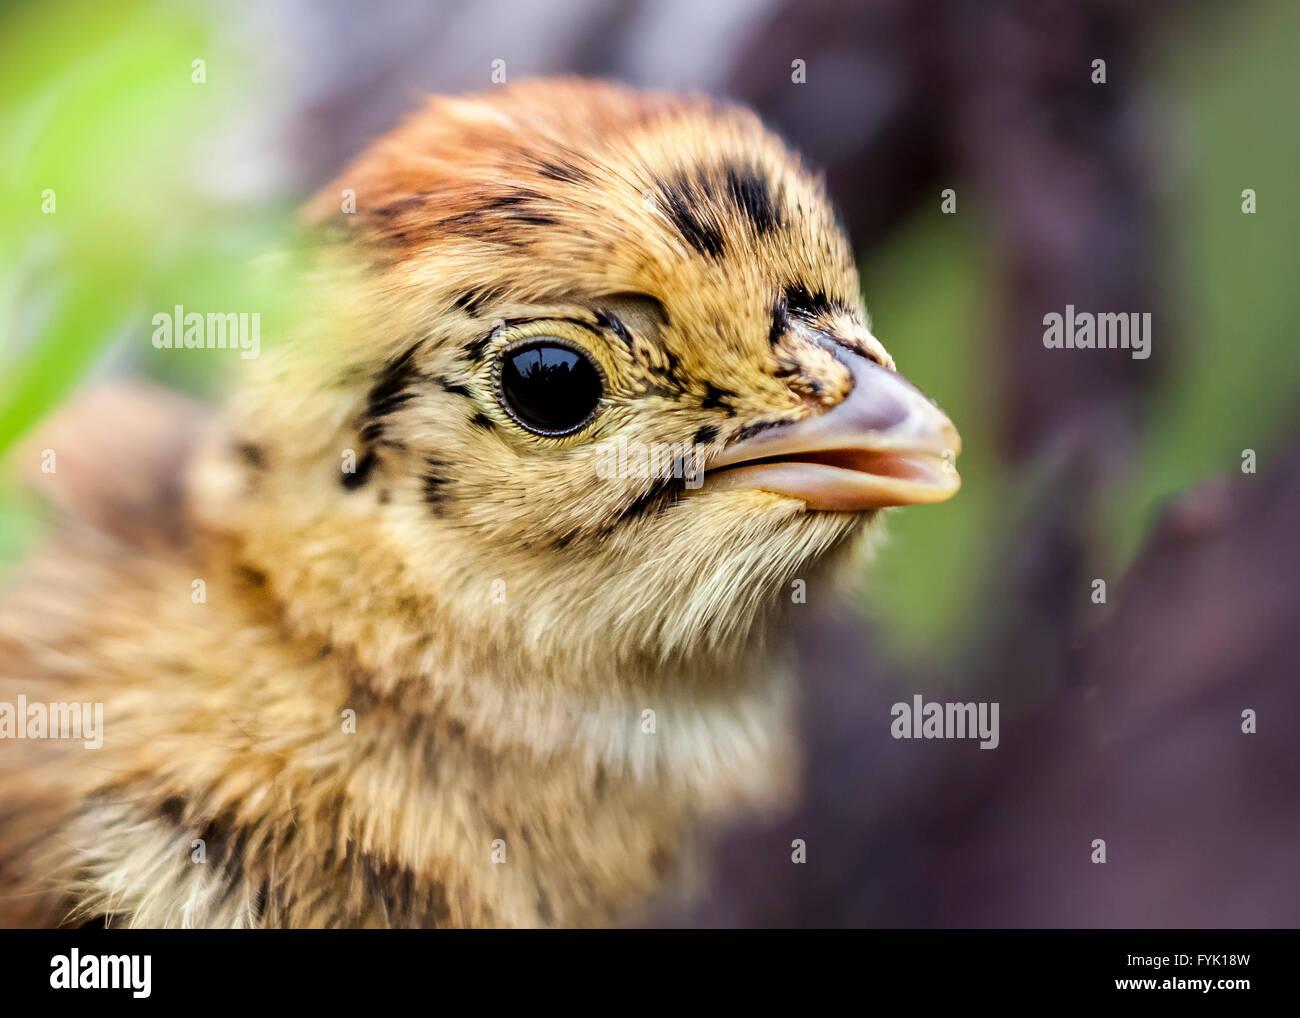 Black grouse chick (Lyrurus tetrix) - Stock Image